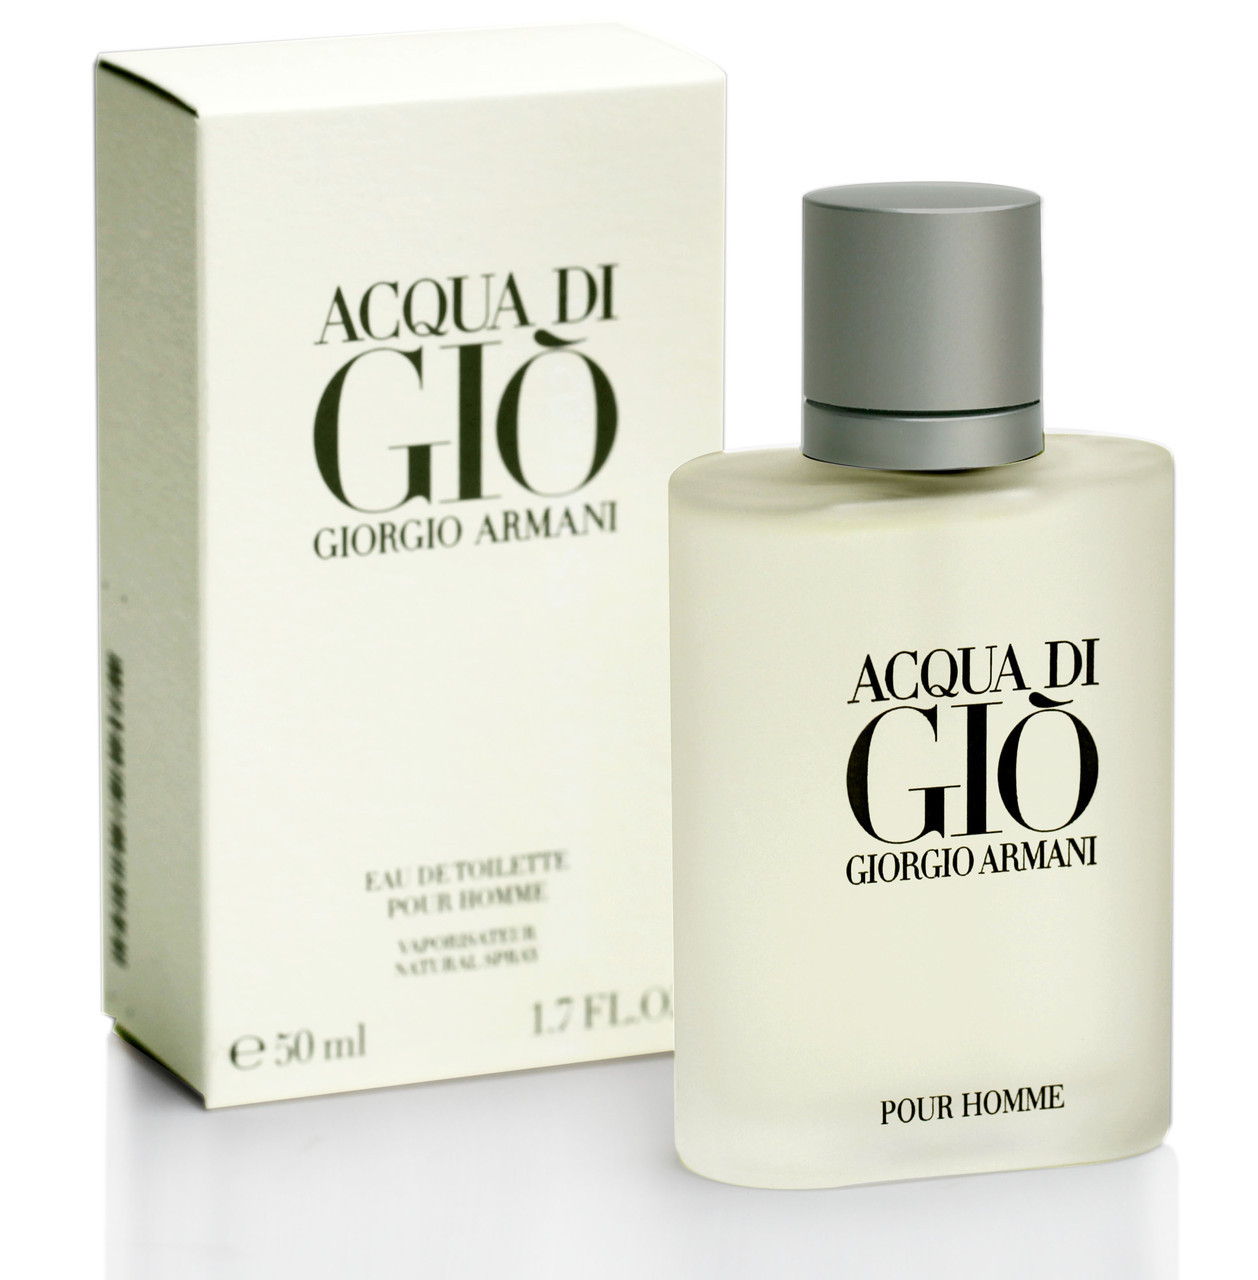 Armani Acqua di Gio pour homme Original size 50ml наливная мужская туалетная вода тестер аромат